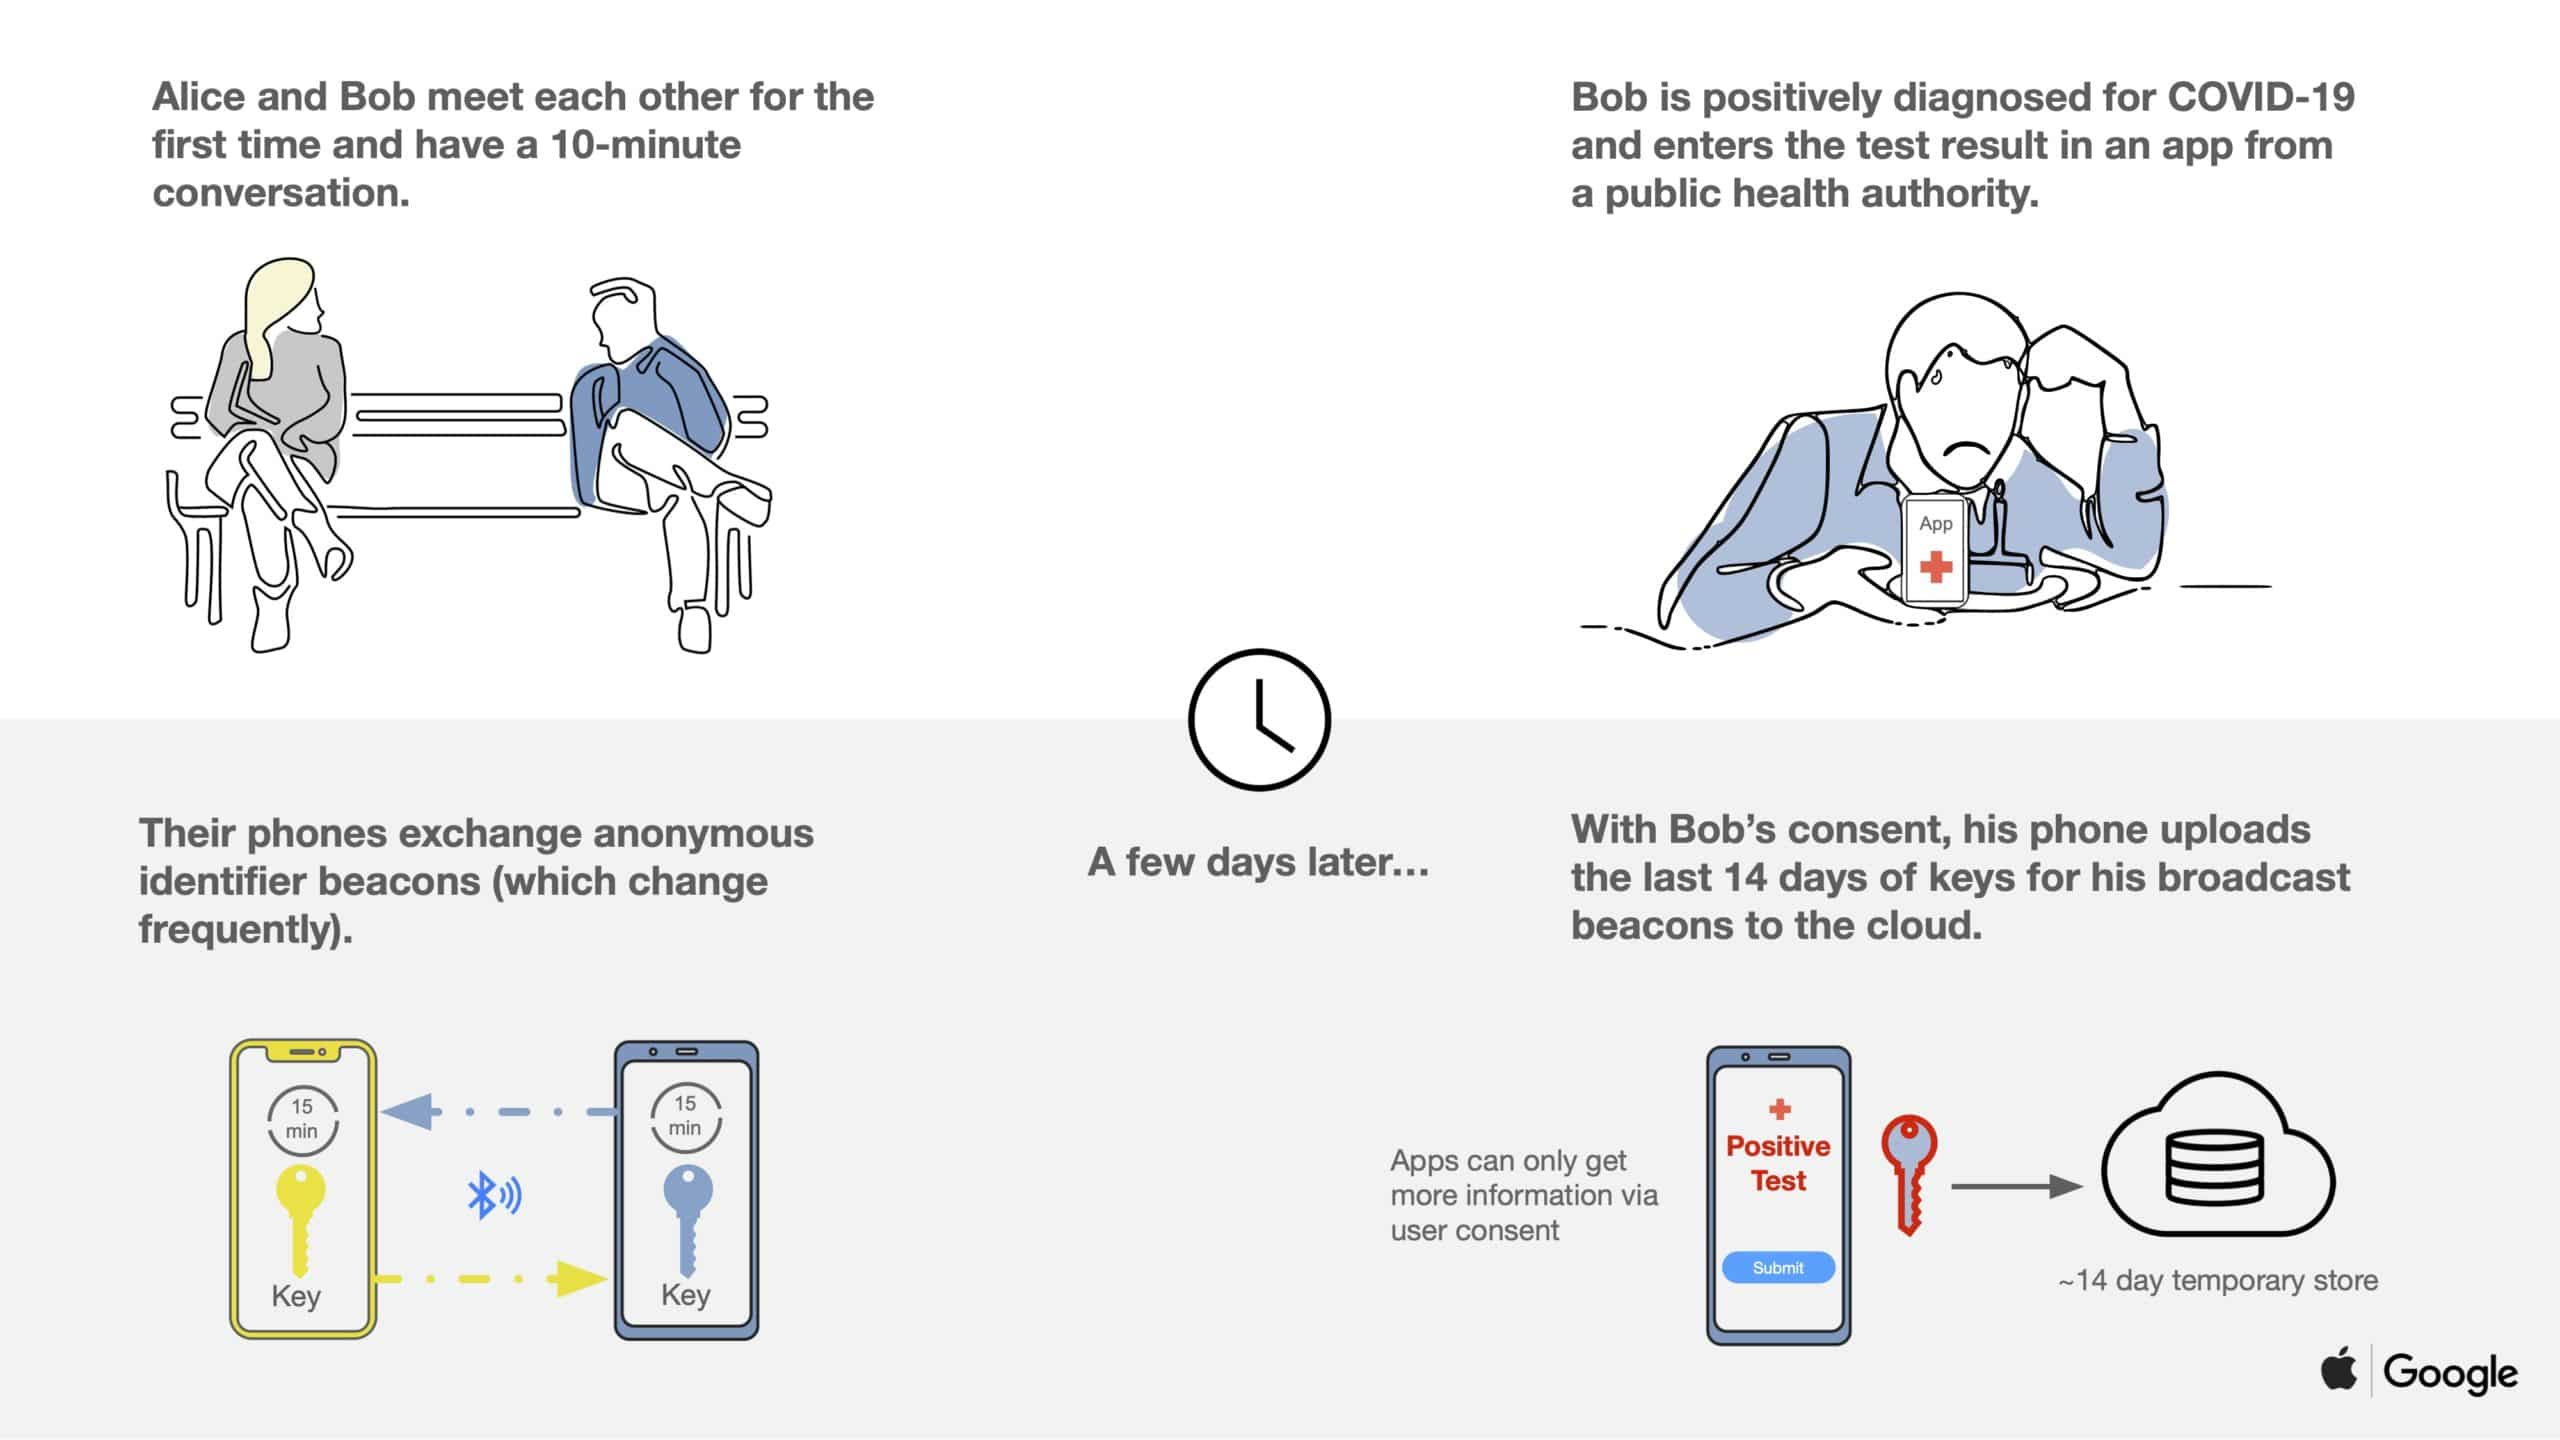 Rastreamento - Apple e Google